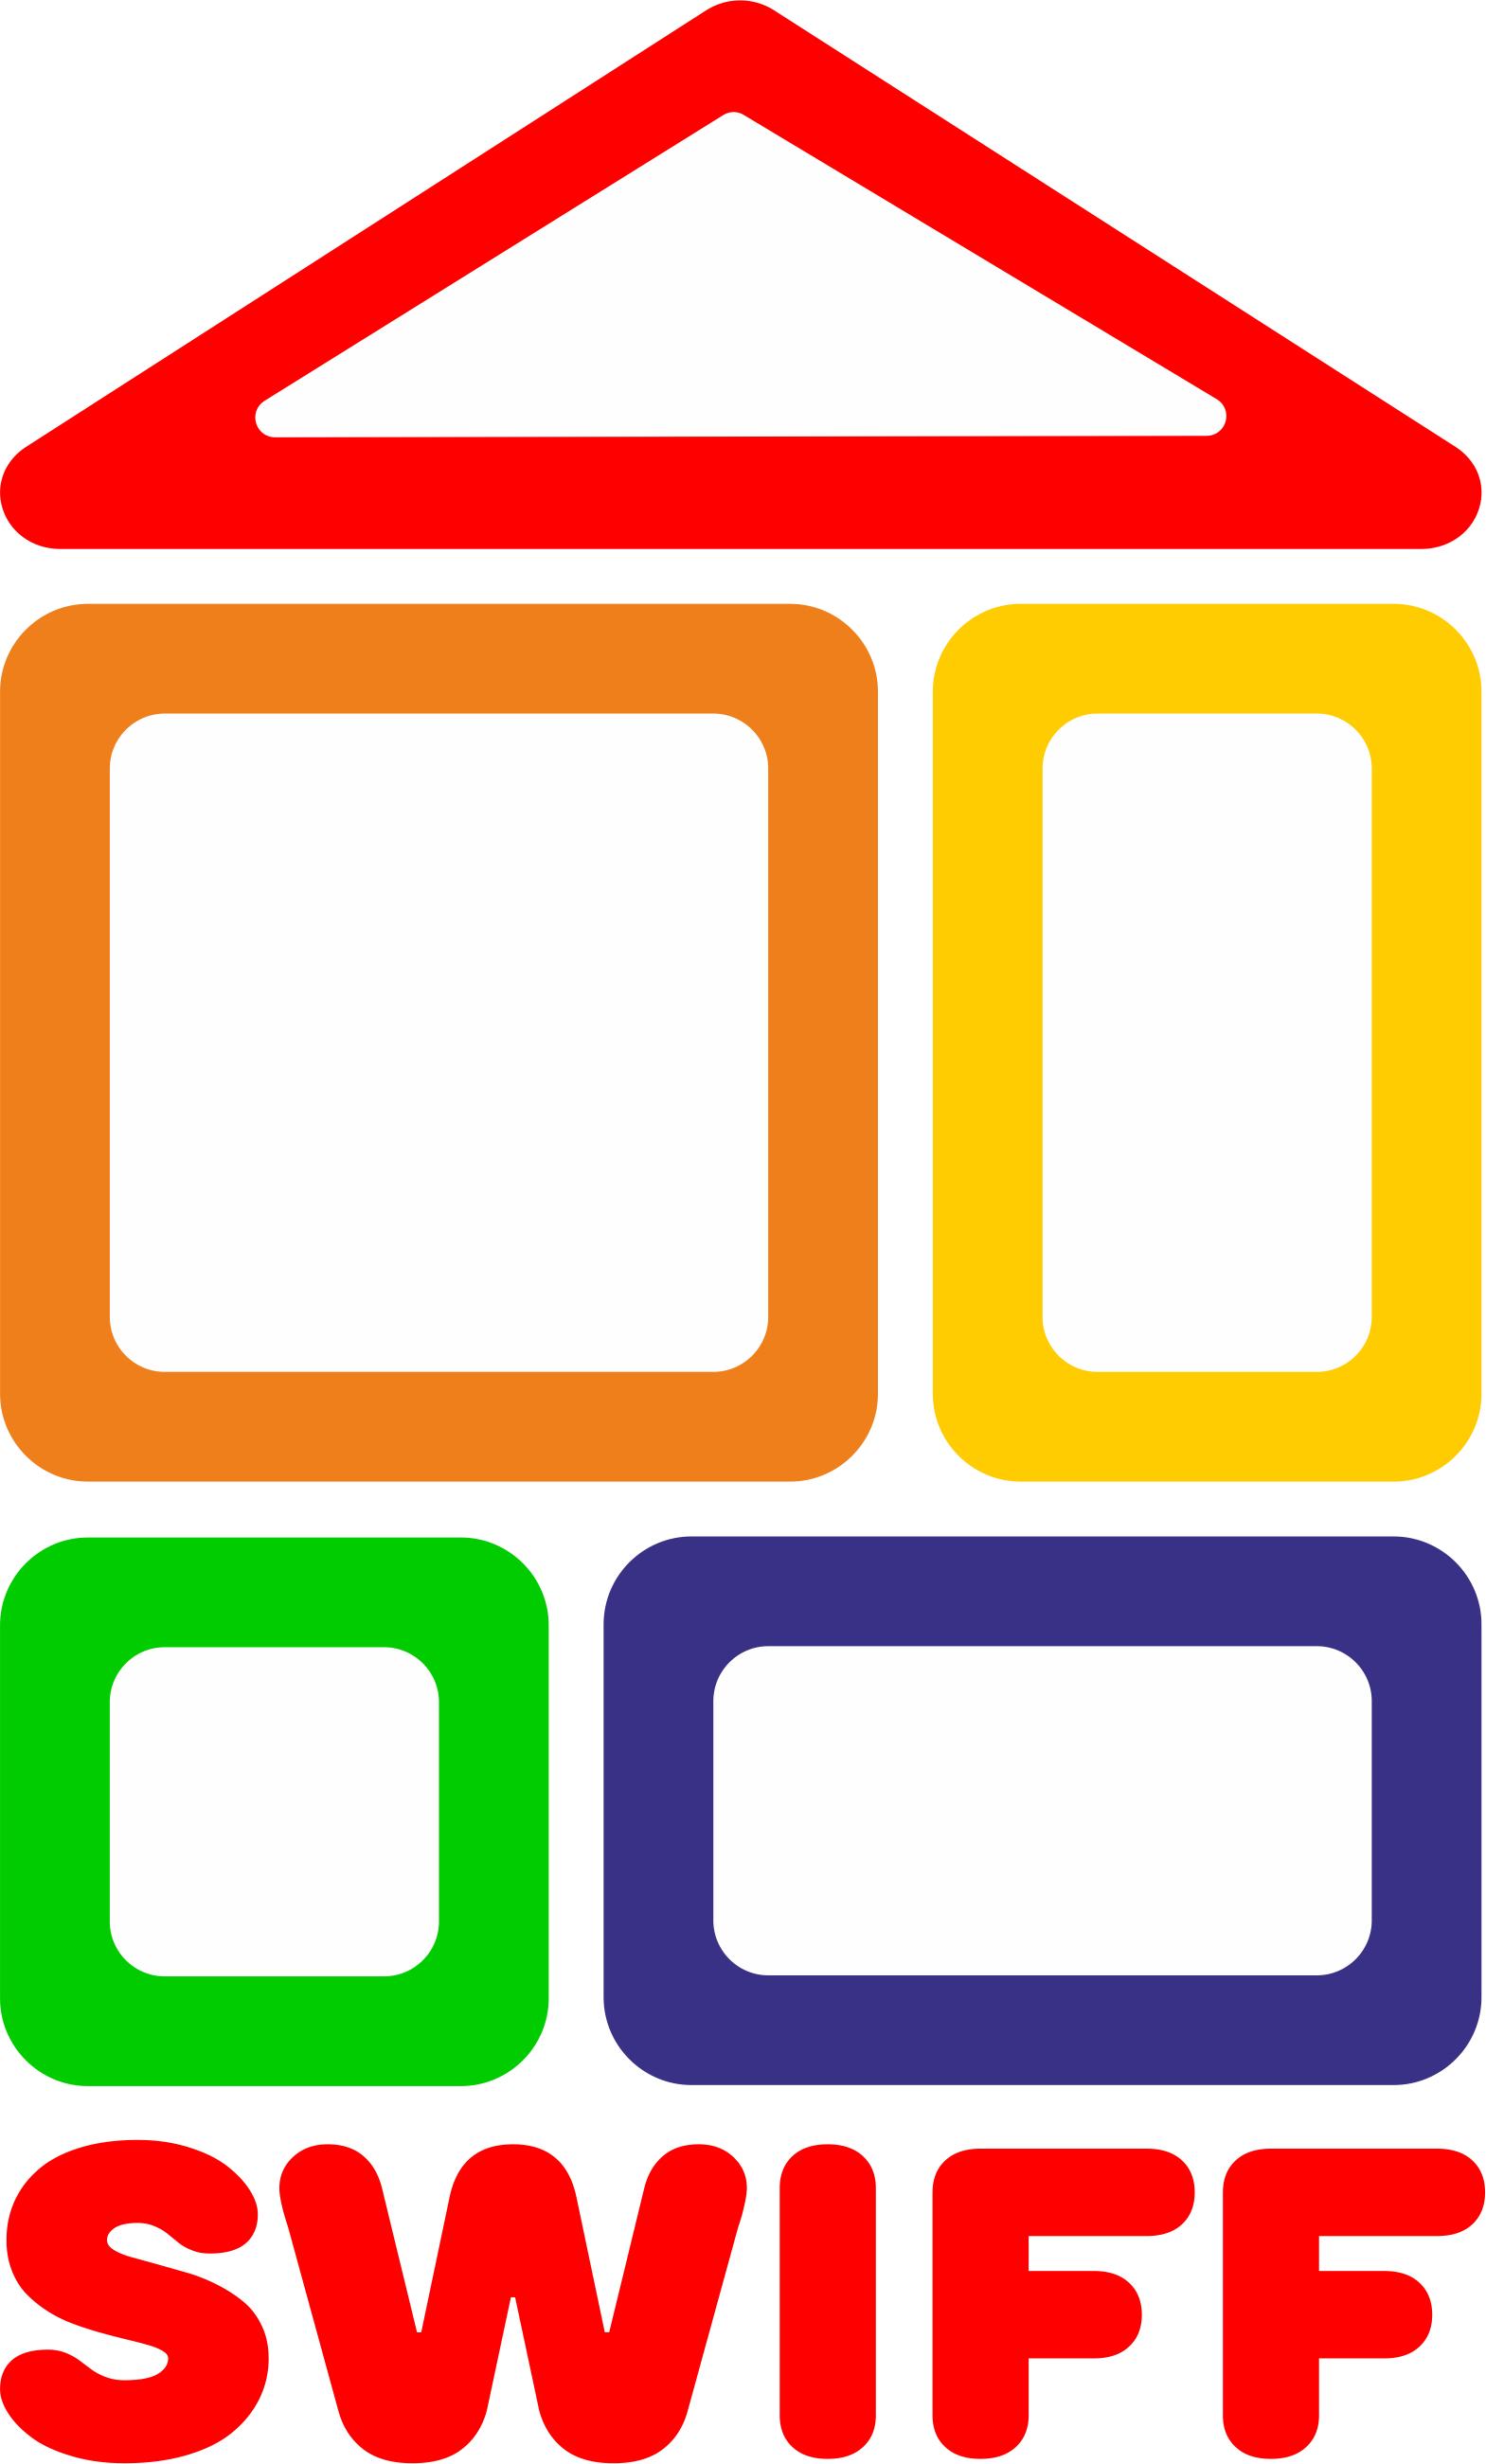 SWIFF_Logoo (002).jpg